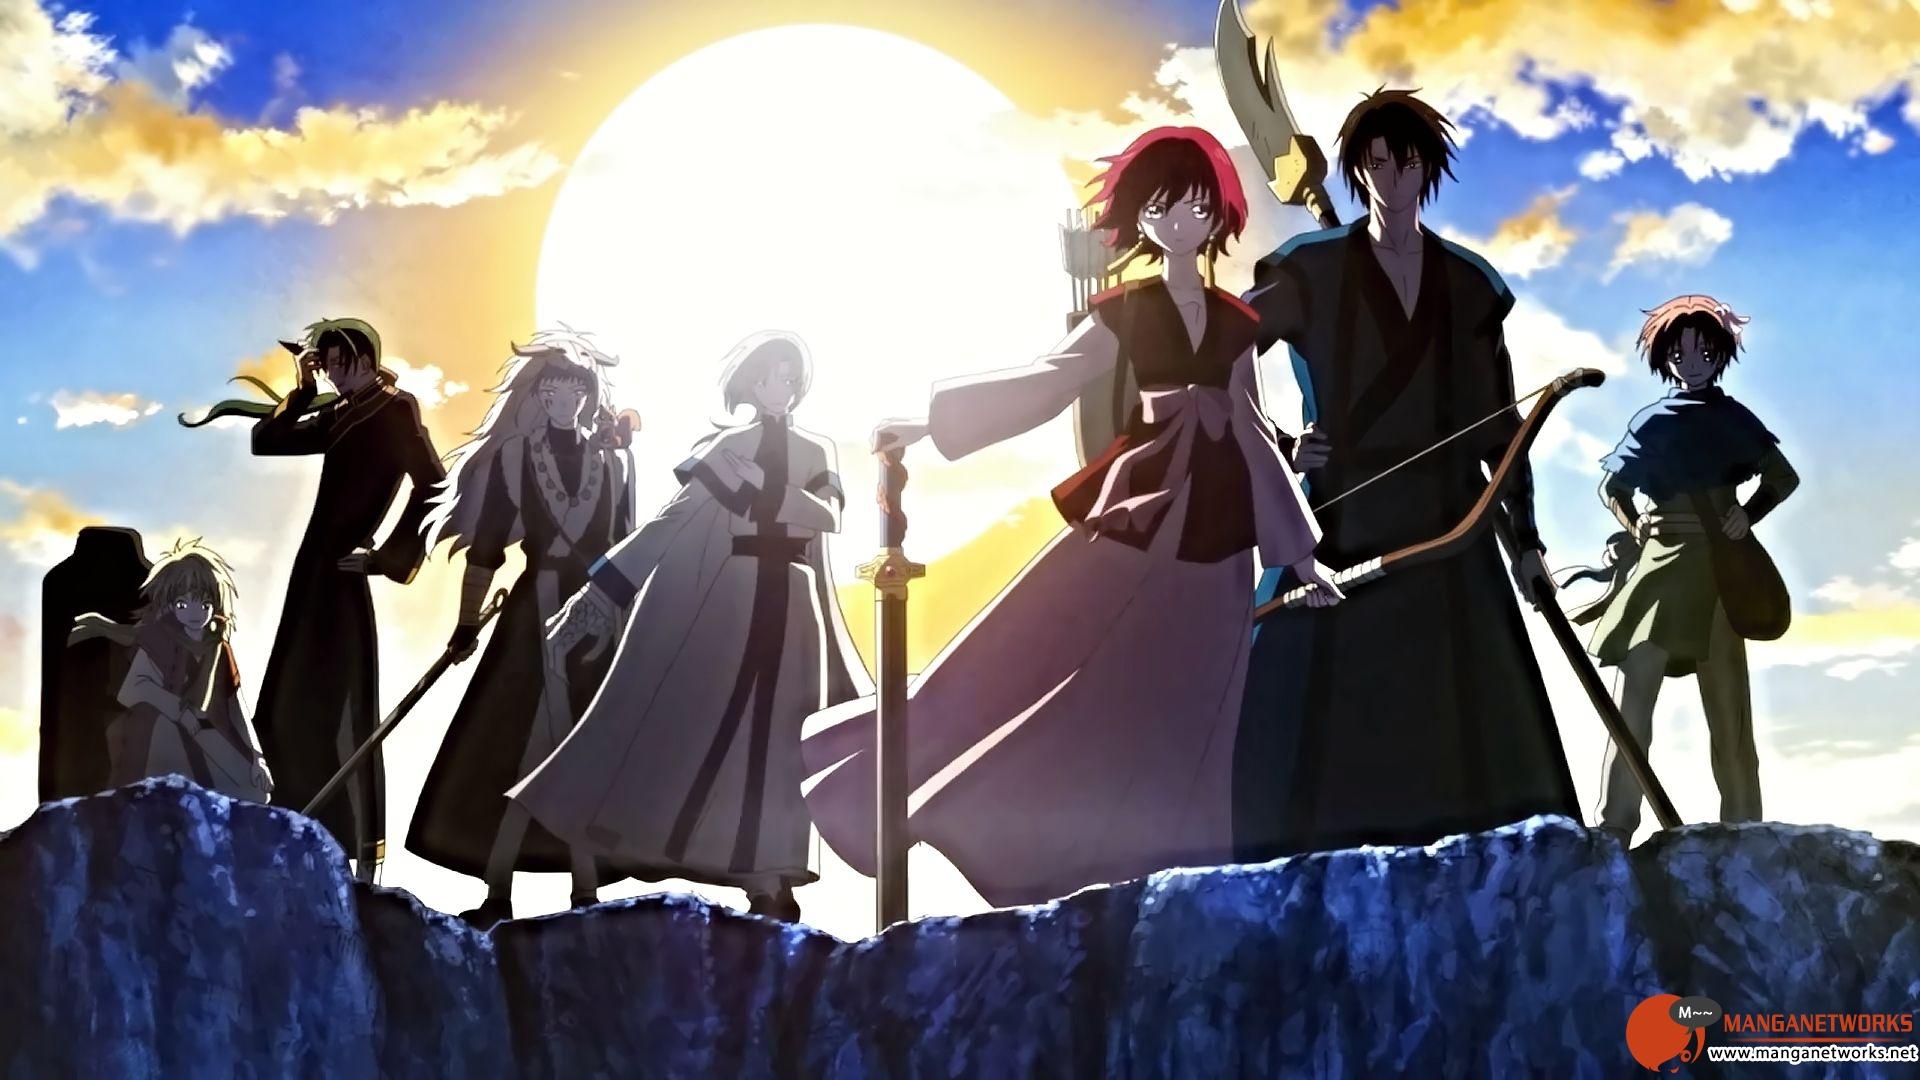 Tin Buồn : Cơ hội có Season 2 của Akatsuki no Yona đang giảm xuống